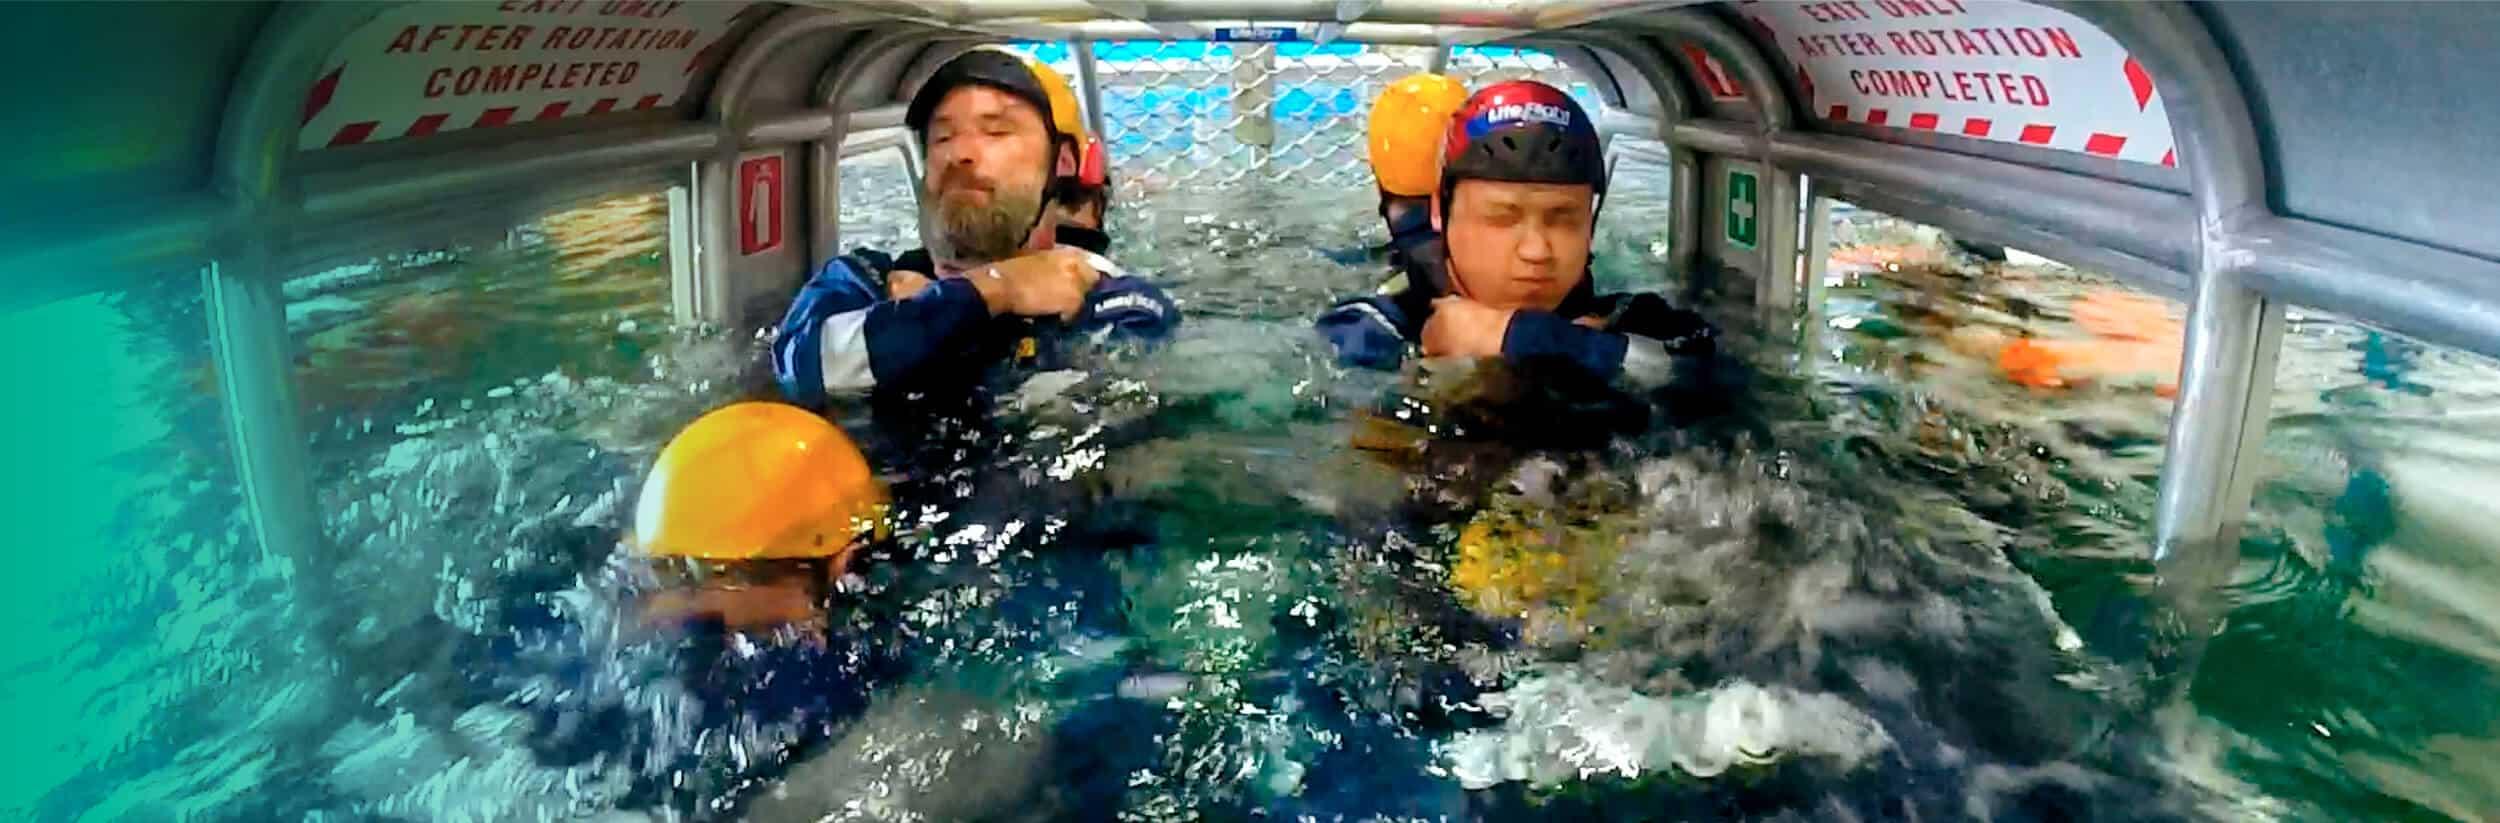 Corporate-Experience-Underwater